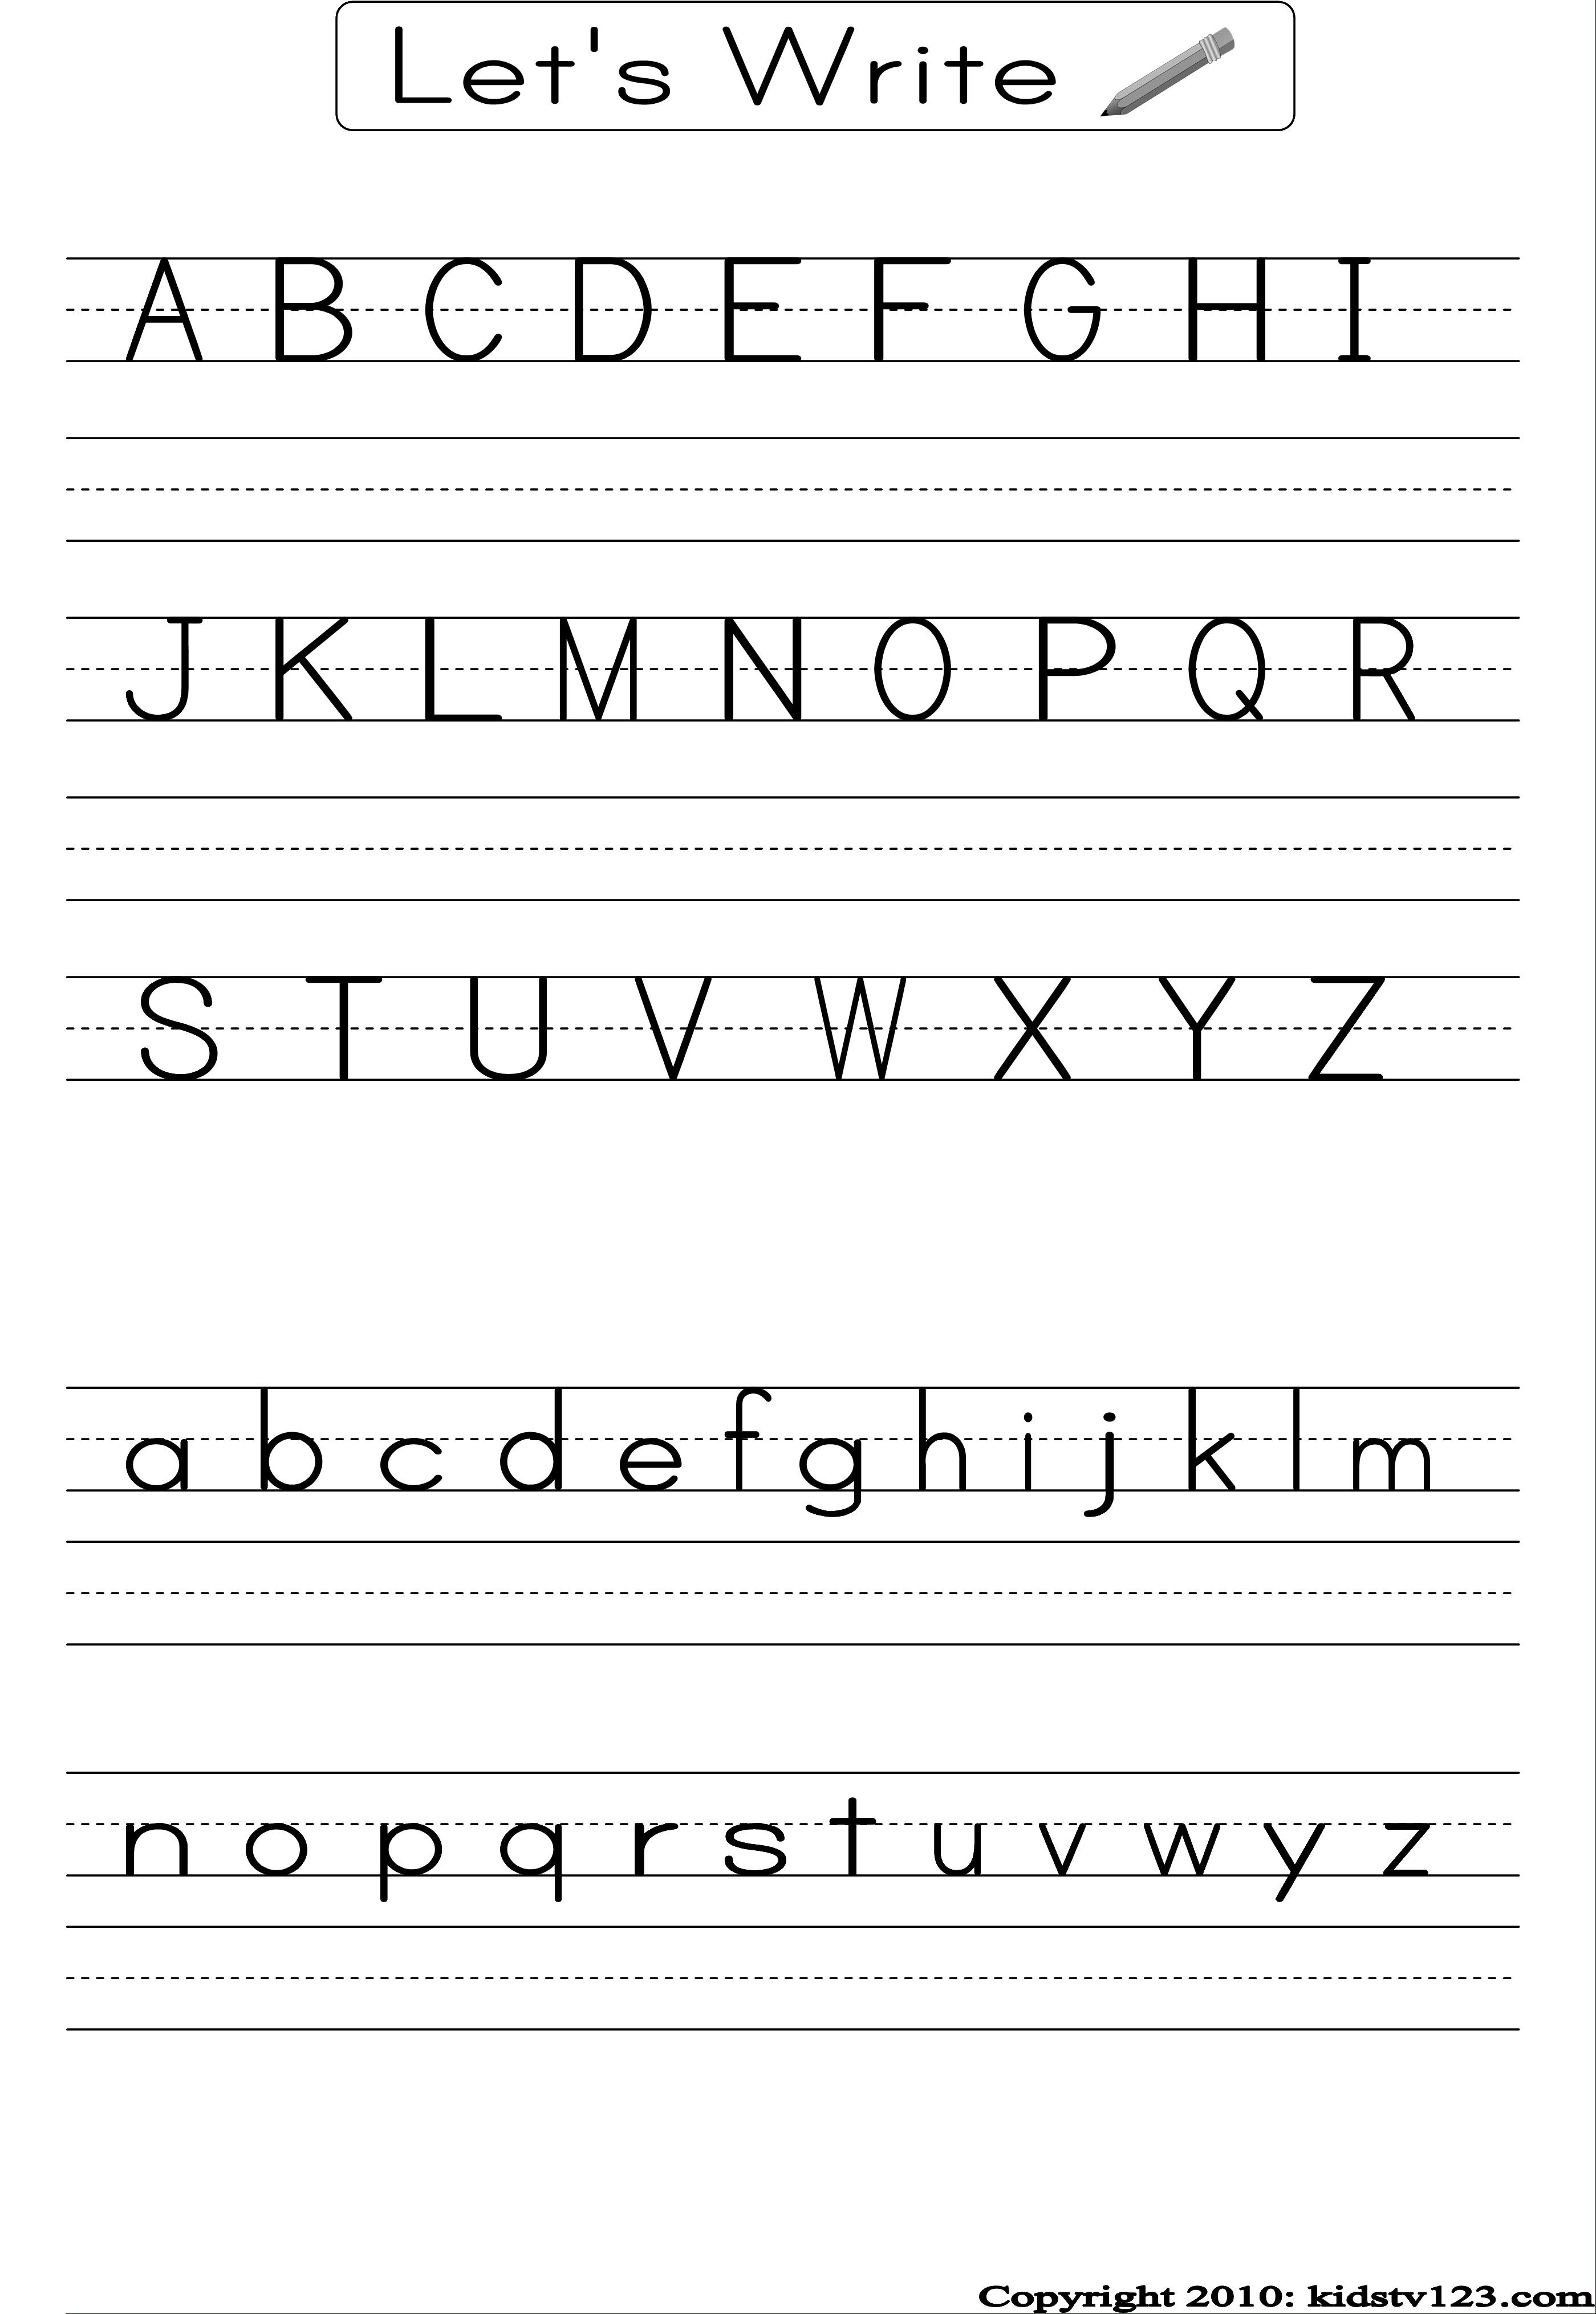 Alphabet Writing Practice Sheet | Alphabet Reinforcement | Alphabet | Free Printable Handwriting Worksheets For Kids